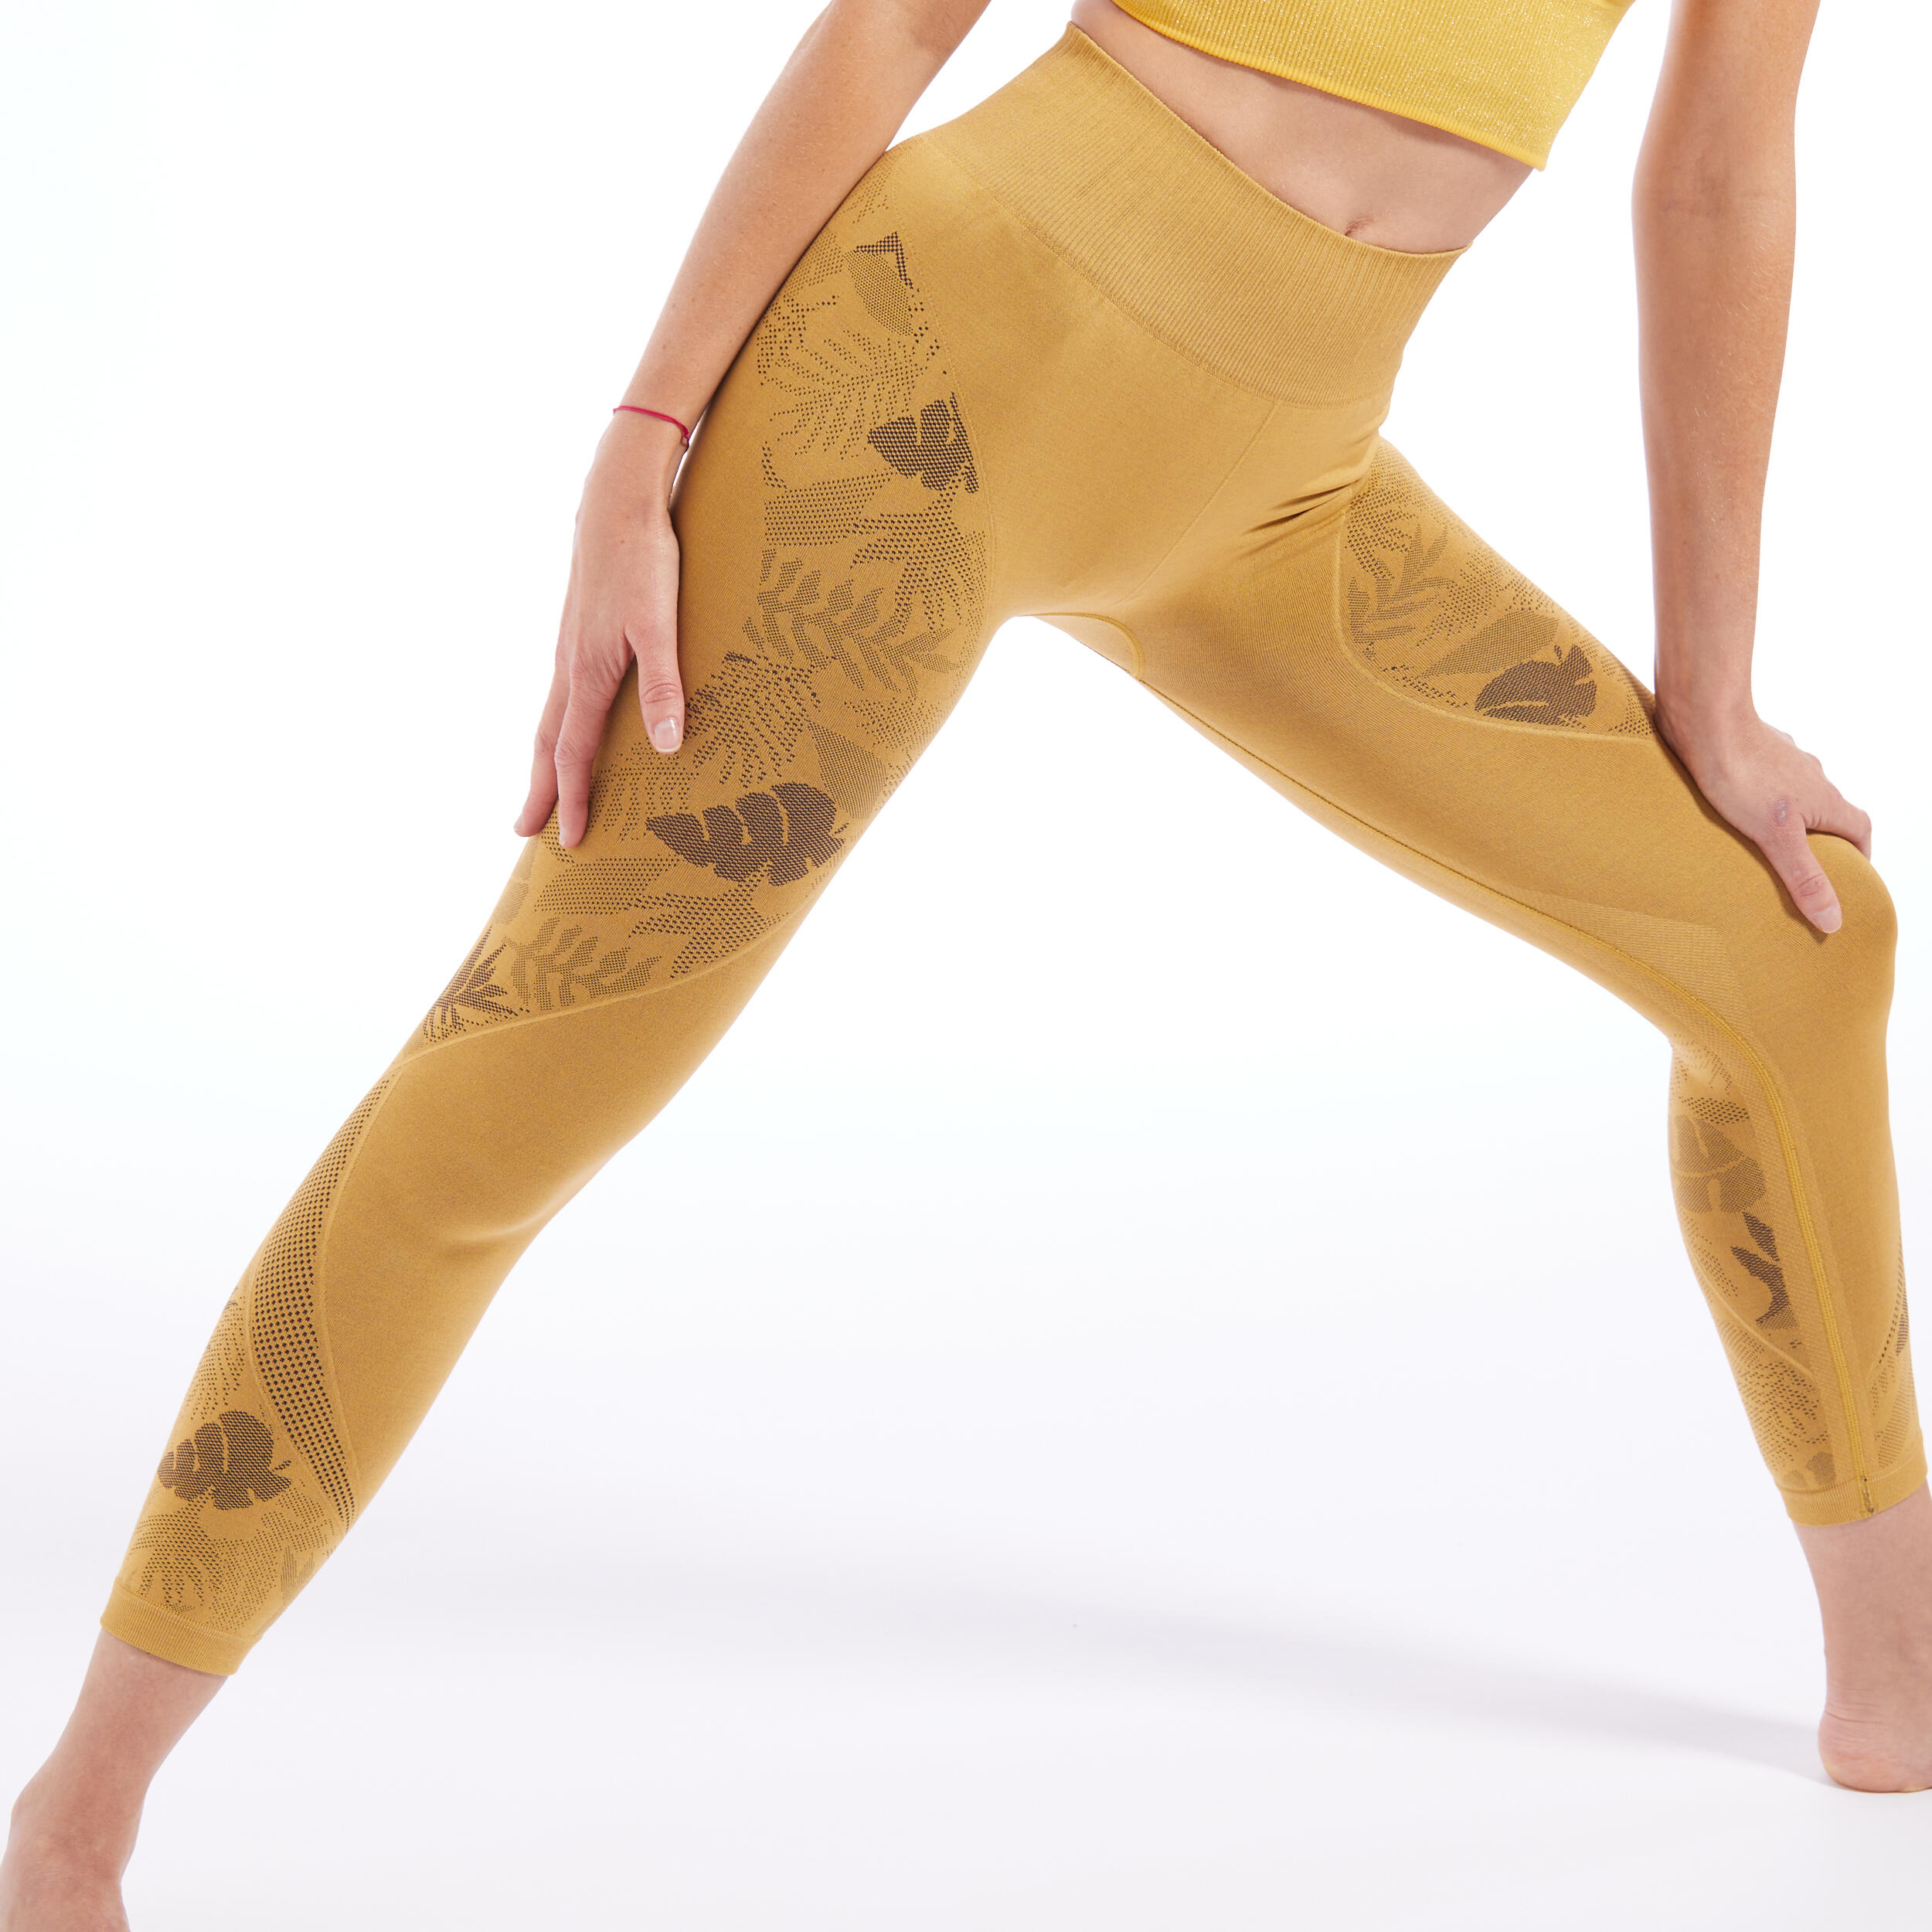 Colanti fara cusaturi 7/8 Yoga image0